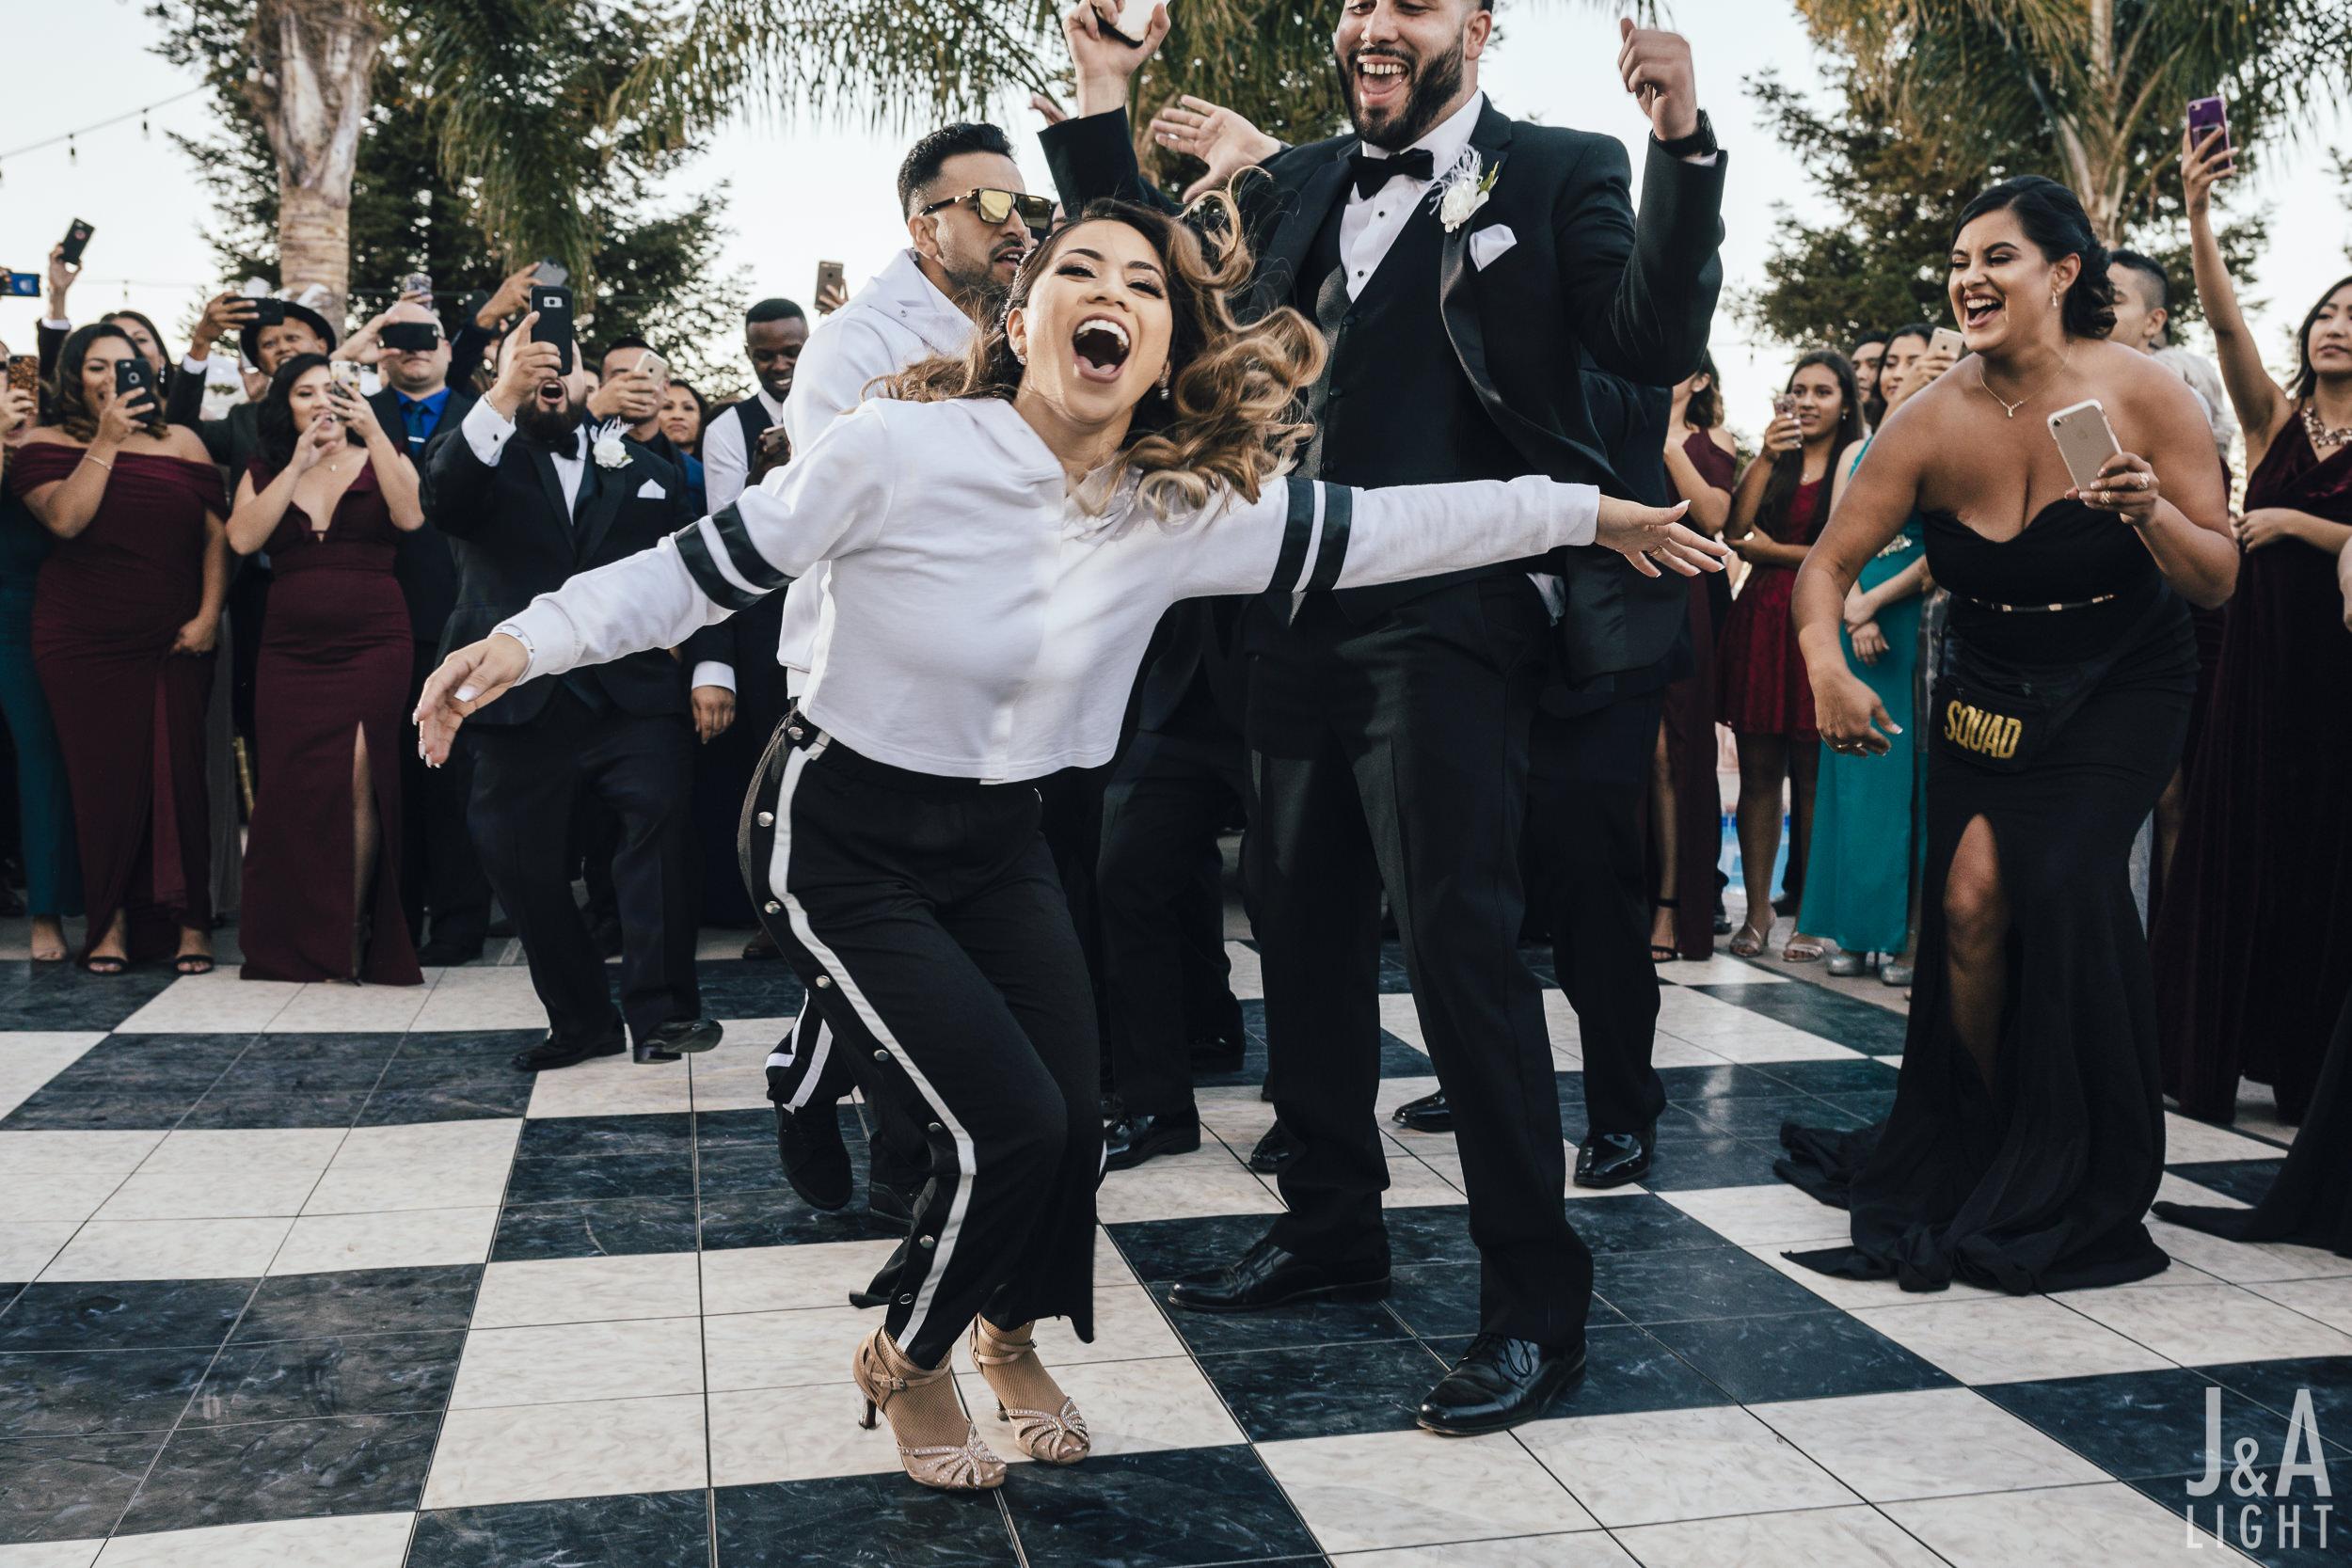 20171014-JanDan-LosBanos-GlassMansion-Wedding-Blog-059.jpg